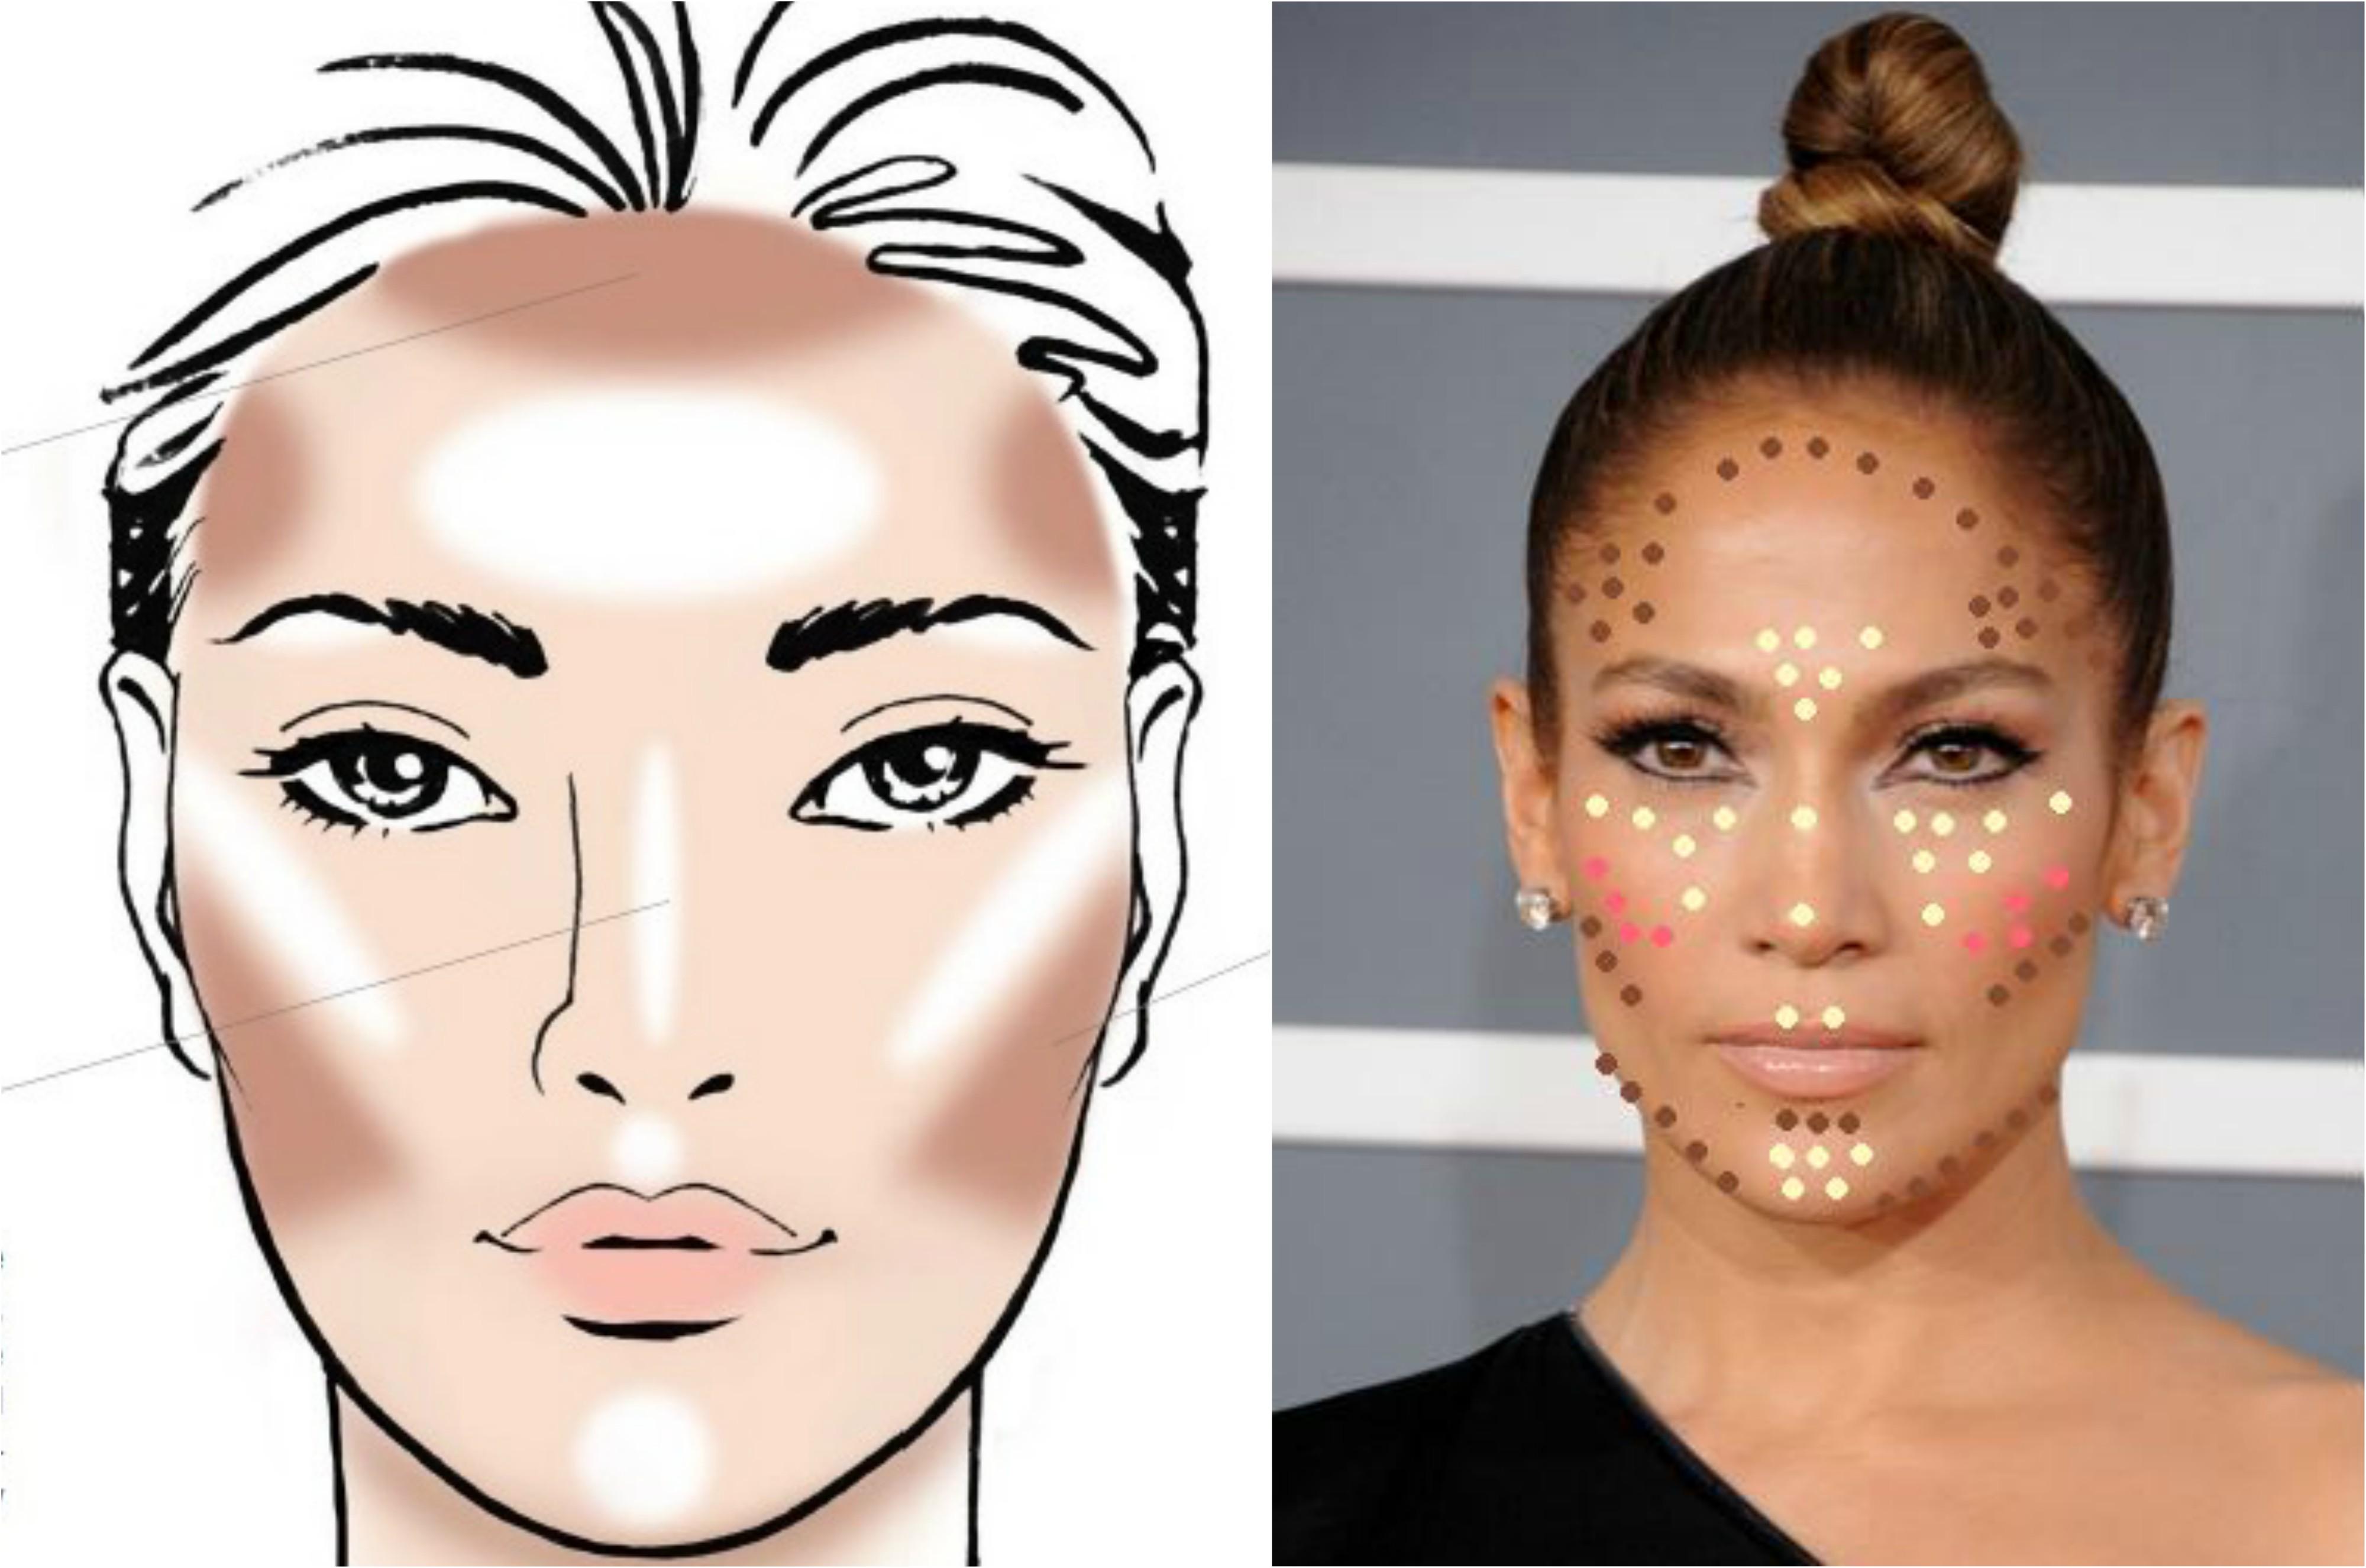 Cmo aplicar contouring de acuerdo con tu tipo de rostro